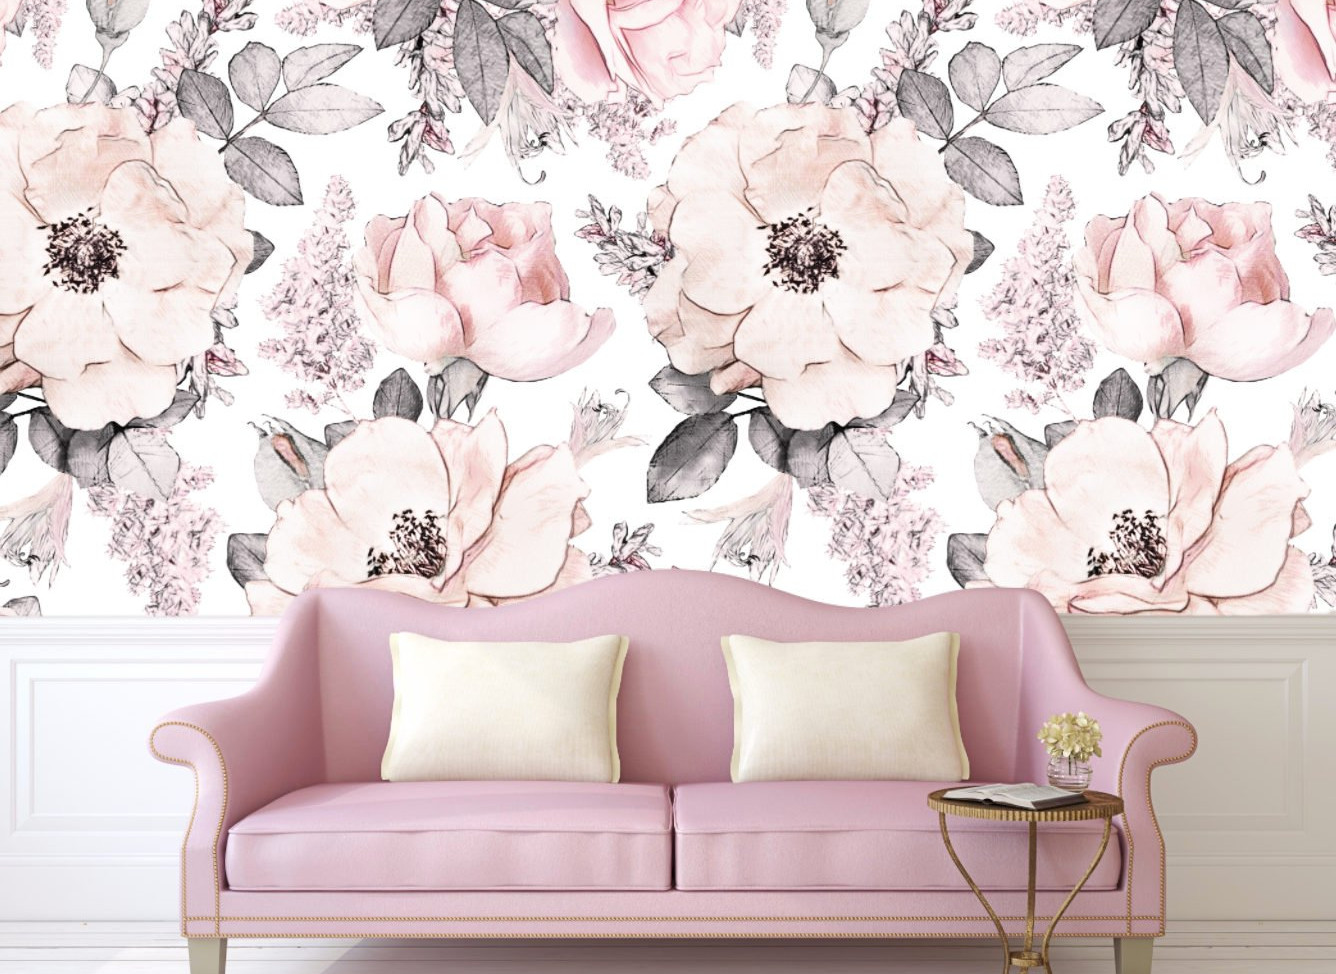 LifeNcolors-best-Floral-wallpaper-large-pink-pattern